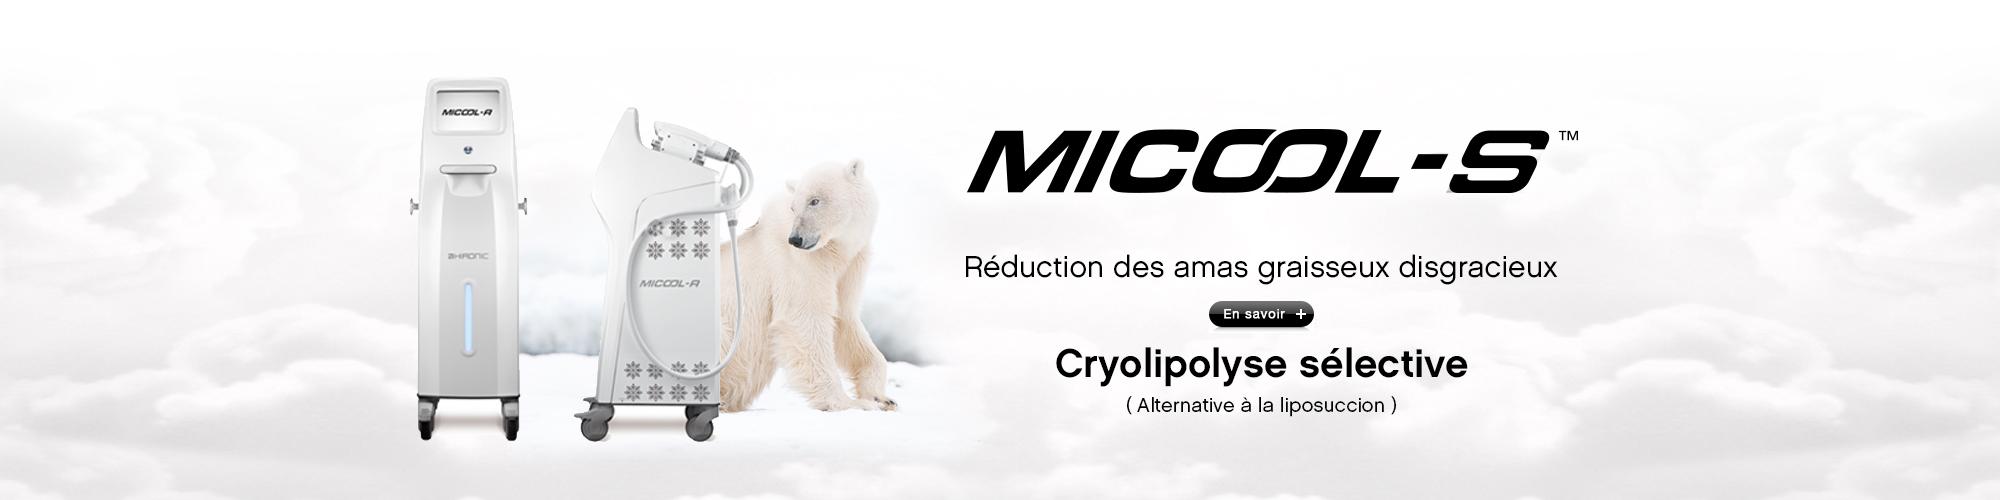 https://www.capactuel.com/storage/app/media/Carousel/accueil/caroussel-micool.jpg